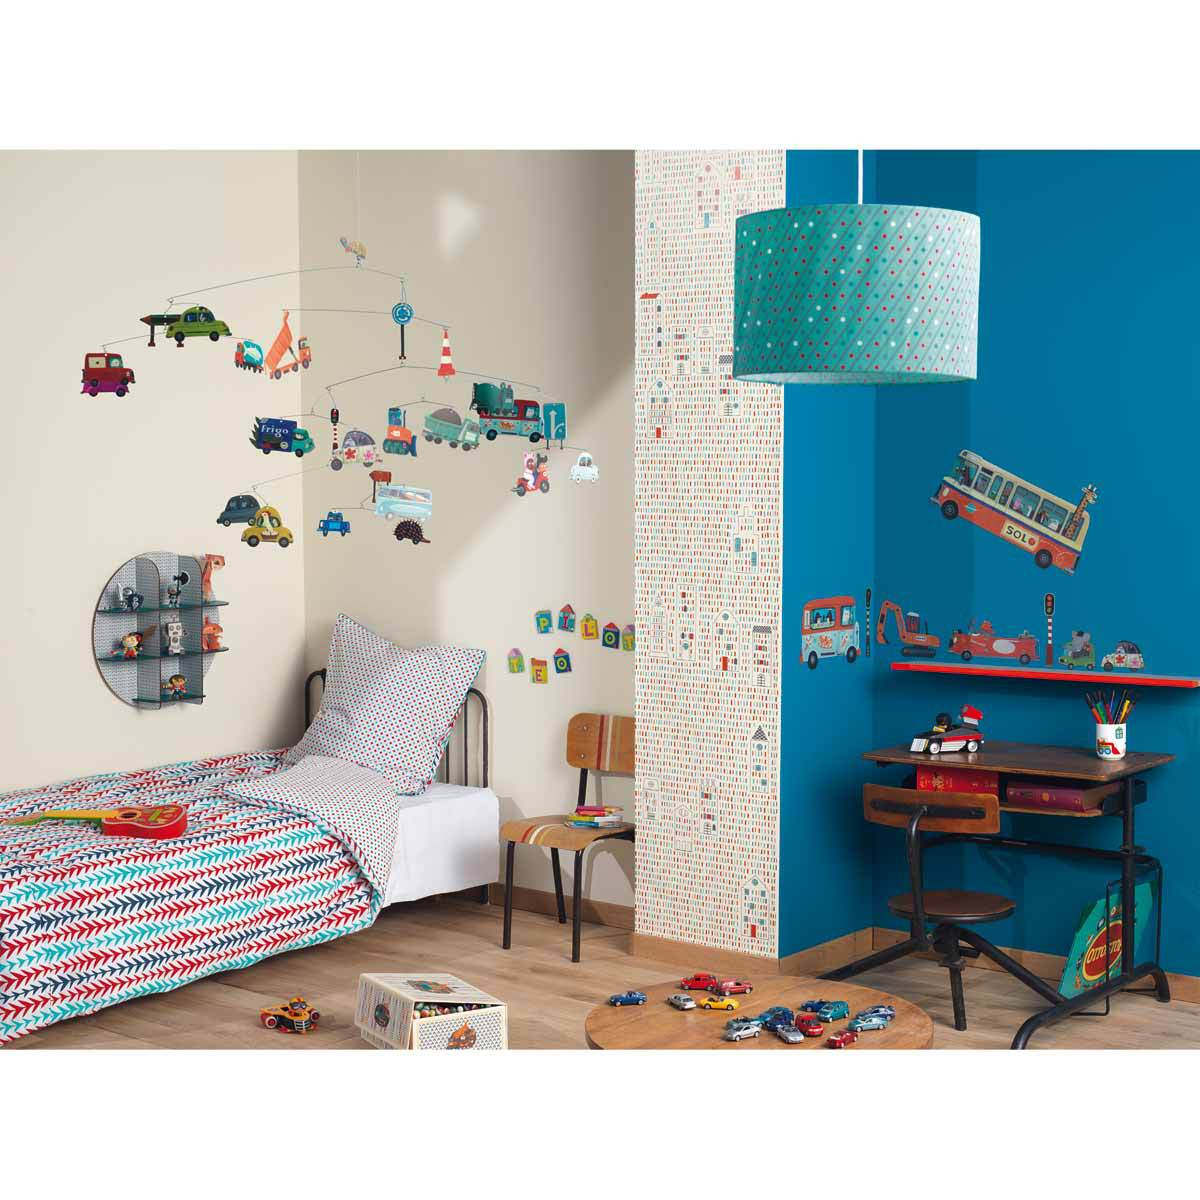 little big room taie d 39 oreiller carr e graphique t o linge de lit little big room sur l. Black Bedroom Furniture Sets. Home Design Ideas